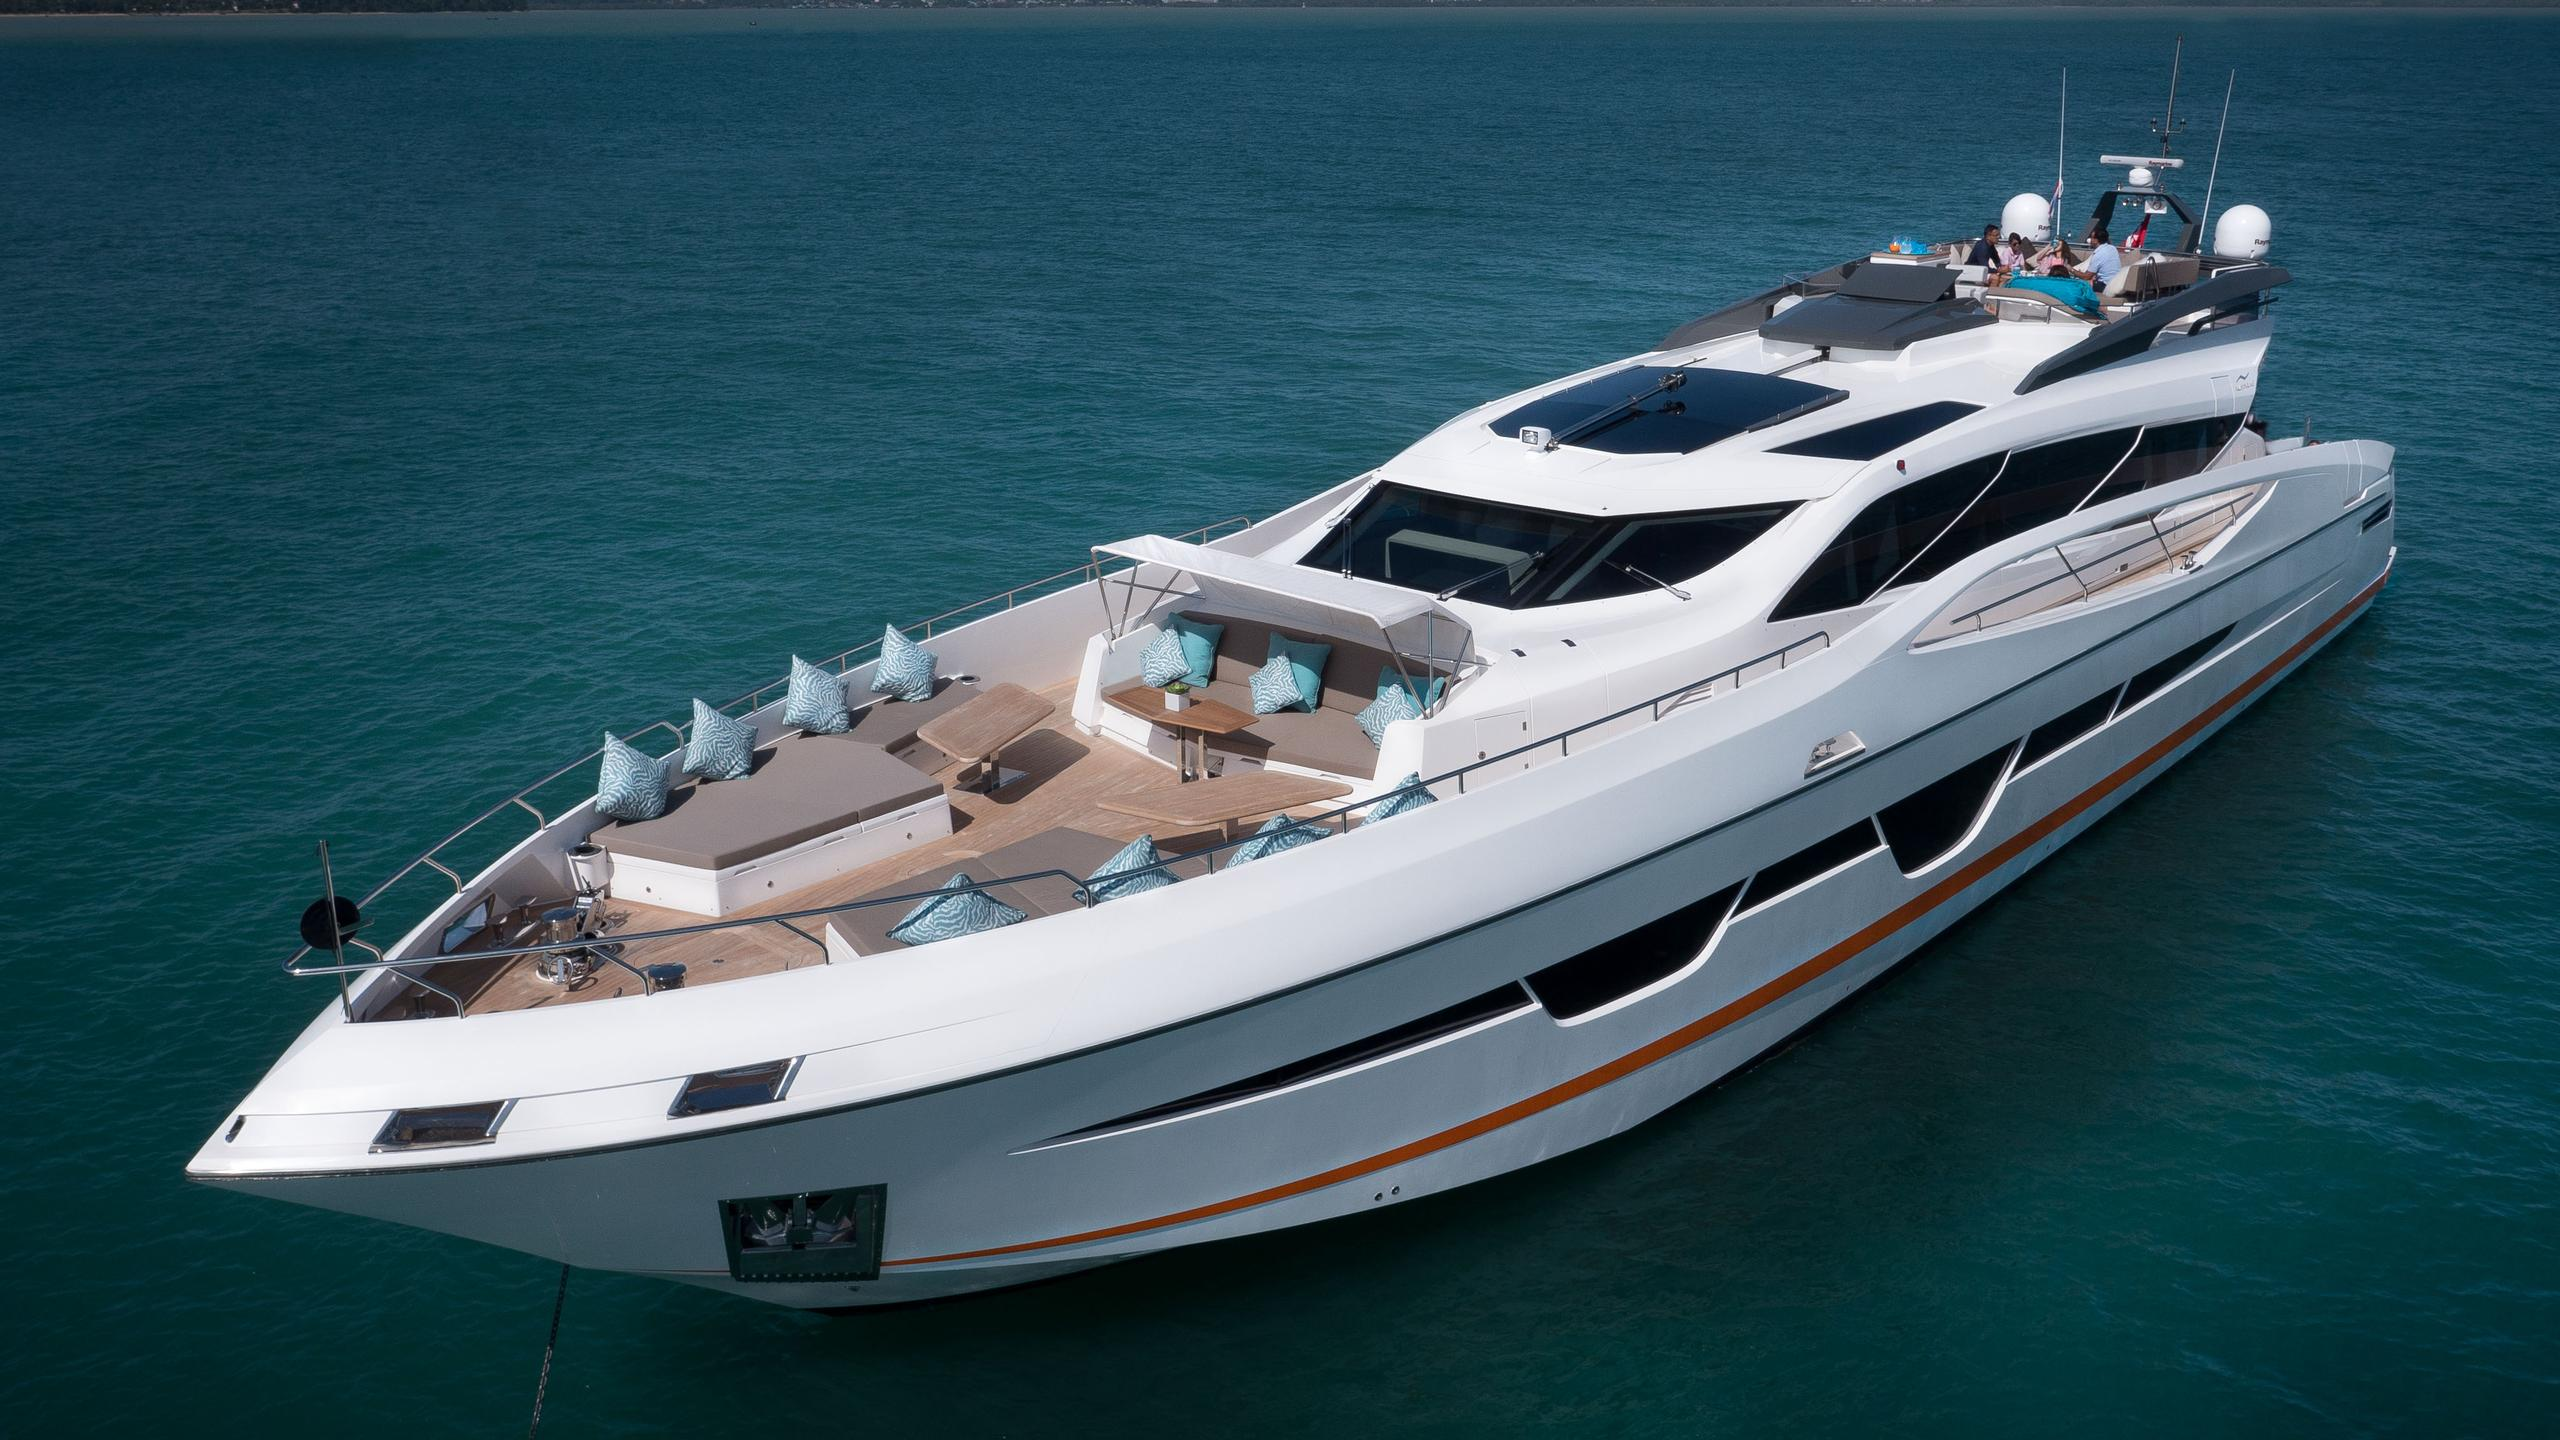 dolce vita motoryacht numarine 105 ht 2017 32m half profile